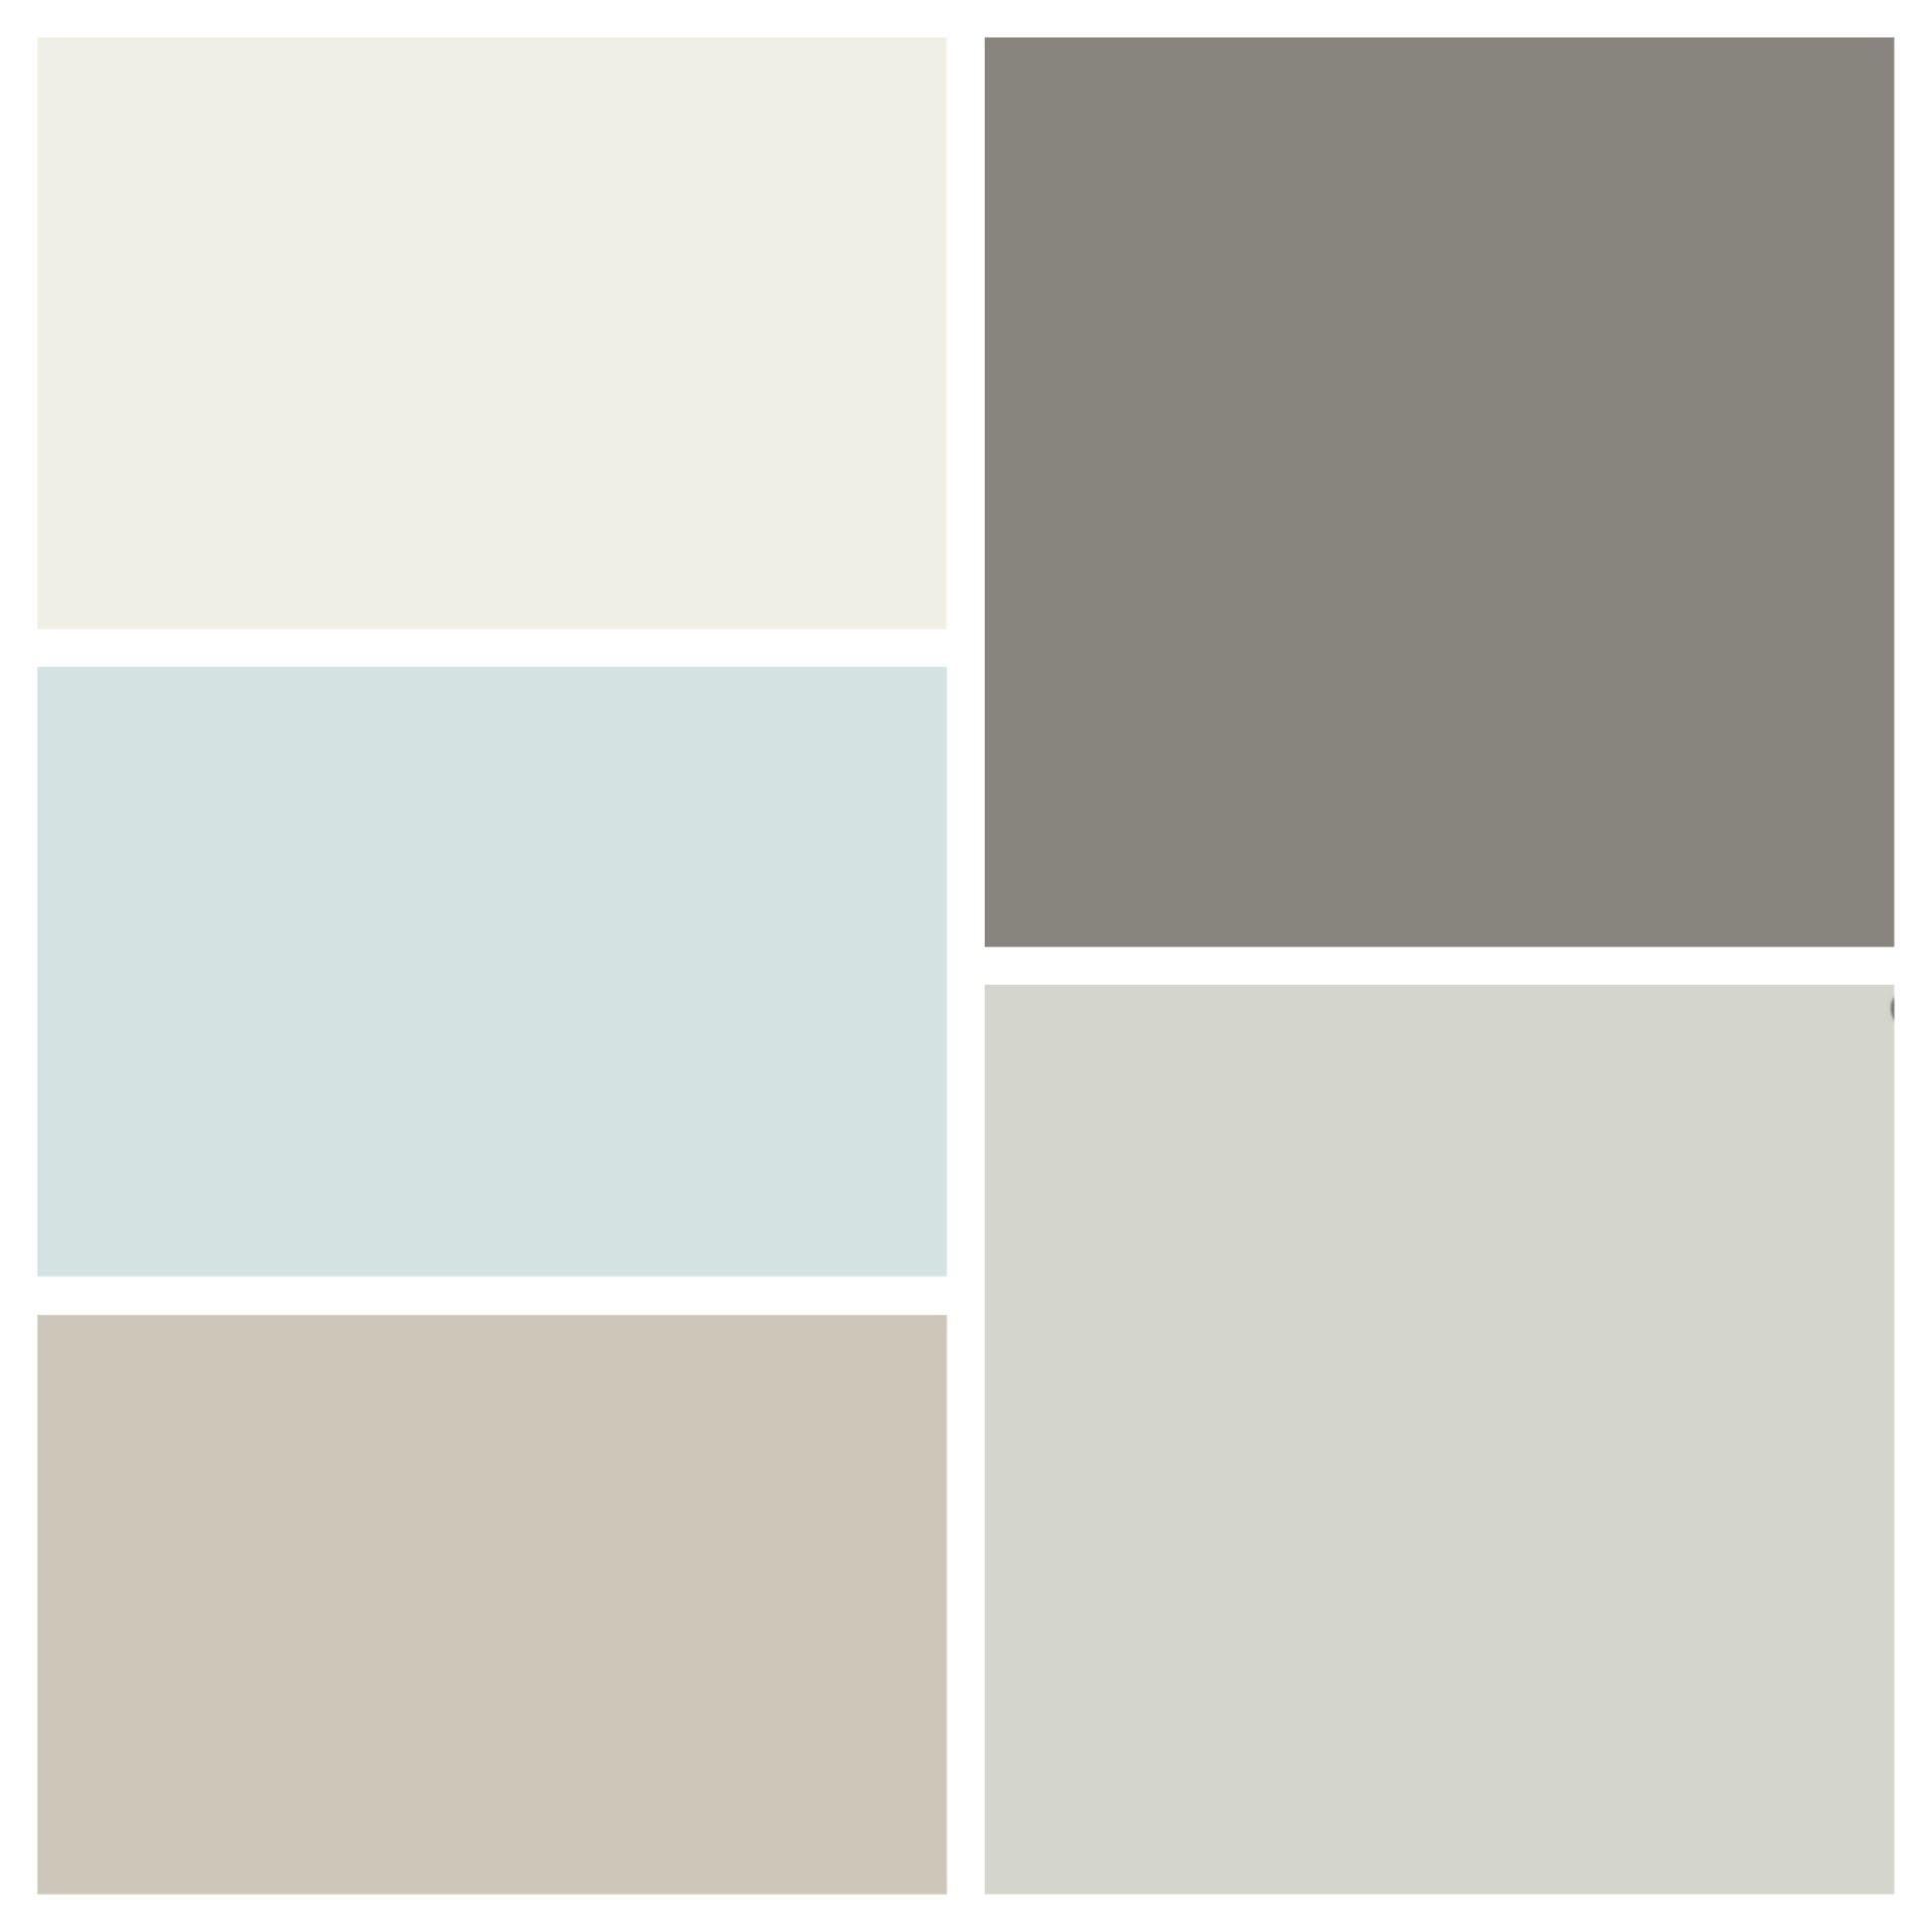 Ben moore white dove - New House Color Scheme Clockwise From Top Left Benjamin Moore White Dove